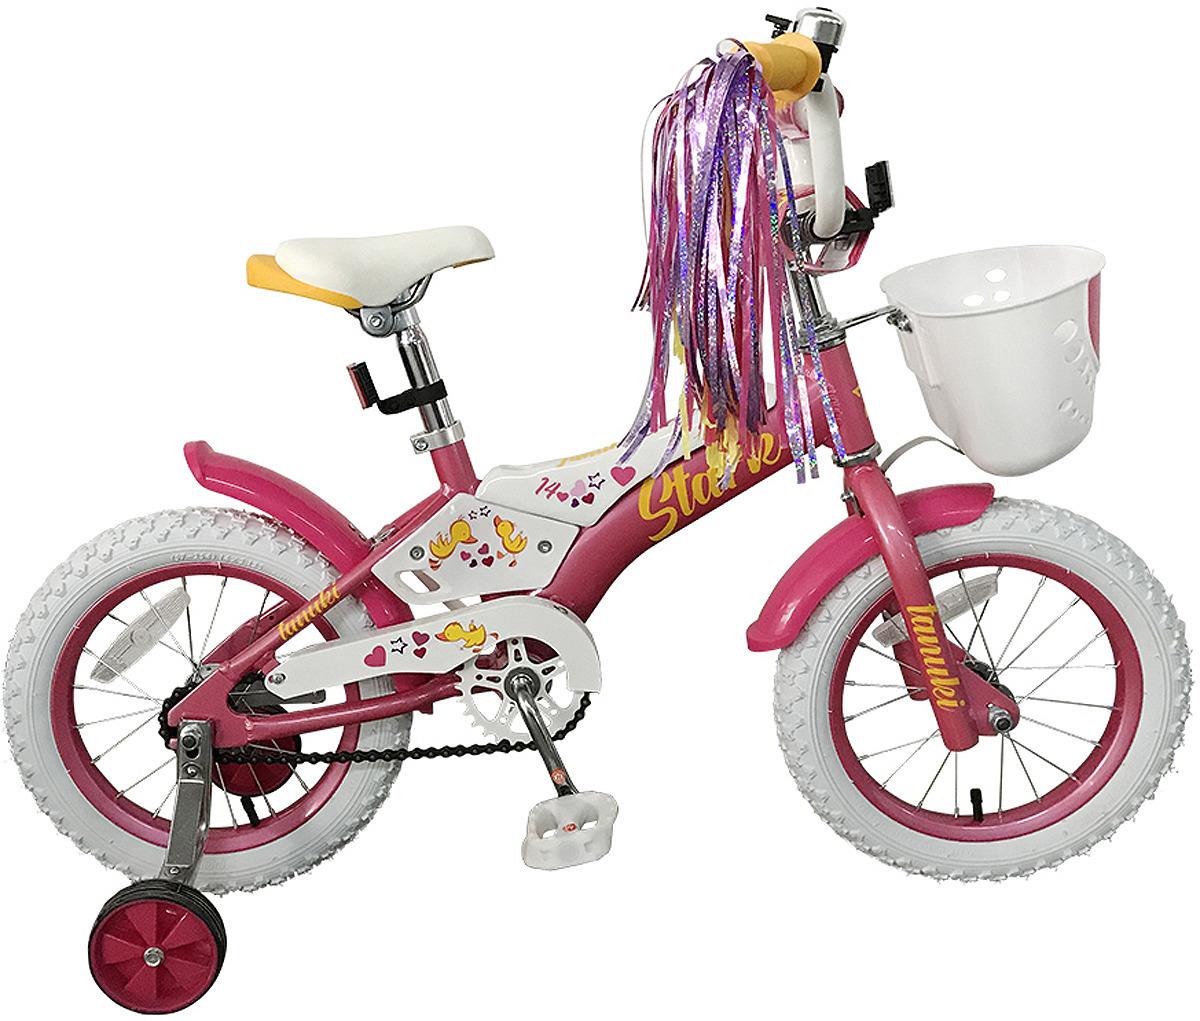 Велосипед детский Stark'19 Tanuki Girl, розовый, белый, желтый, диаметр колес 14